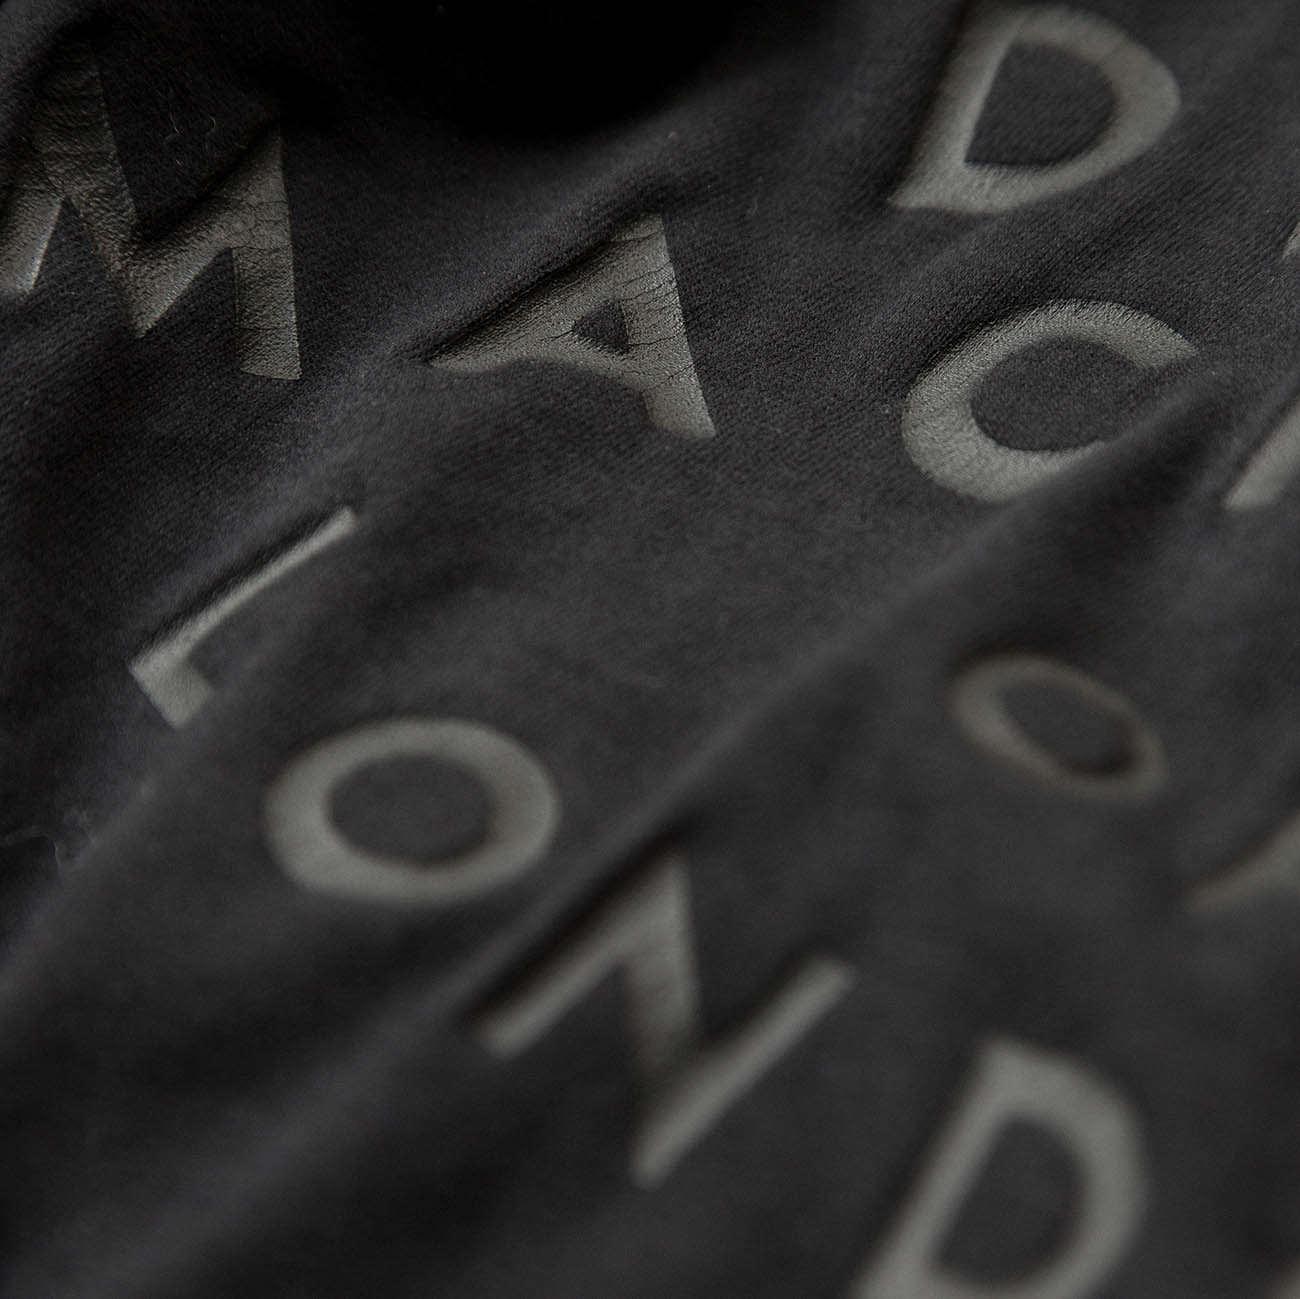 Death Machines of London Tee 4 - Death Machines of London Tee